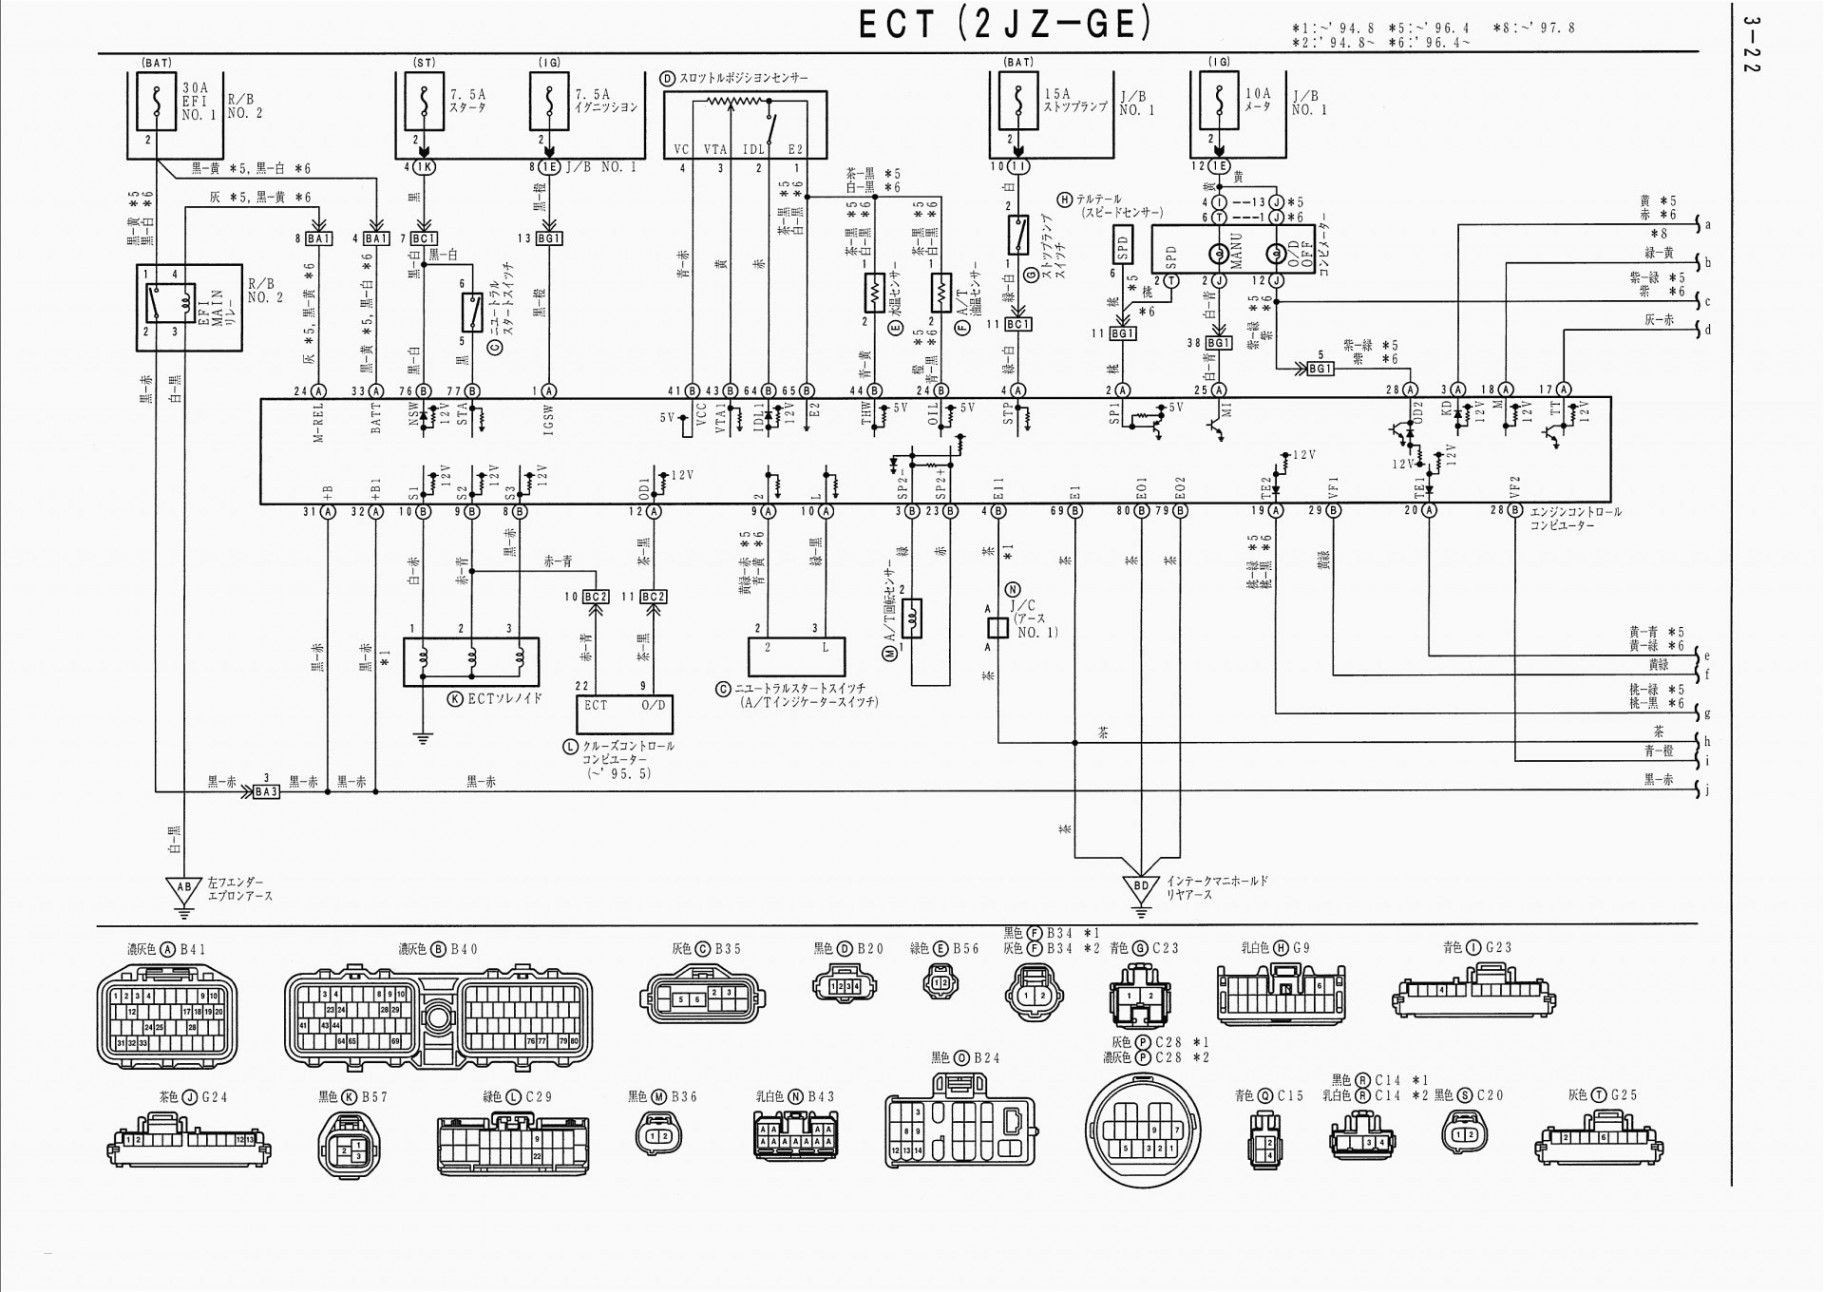 Peterbilt Air System Diagram Diagram] Bmw F10 Wiring Diagram Uk Full Version Hd Quality Of Peterbilt Air System Diagram